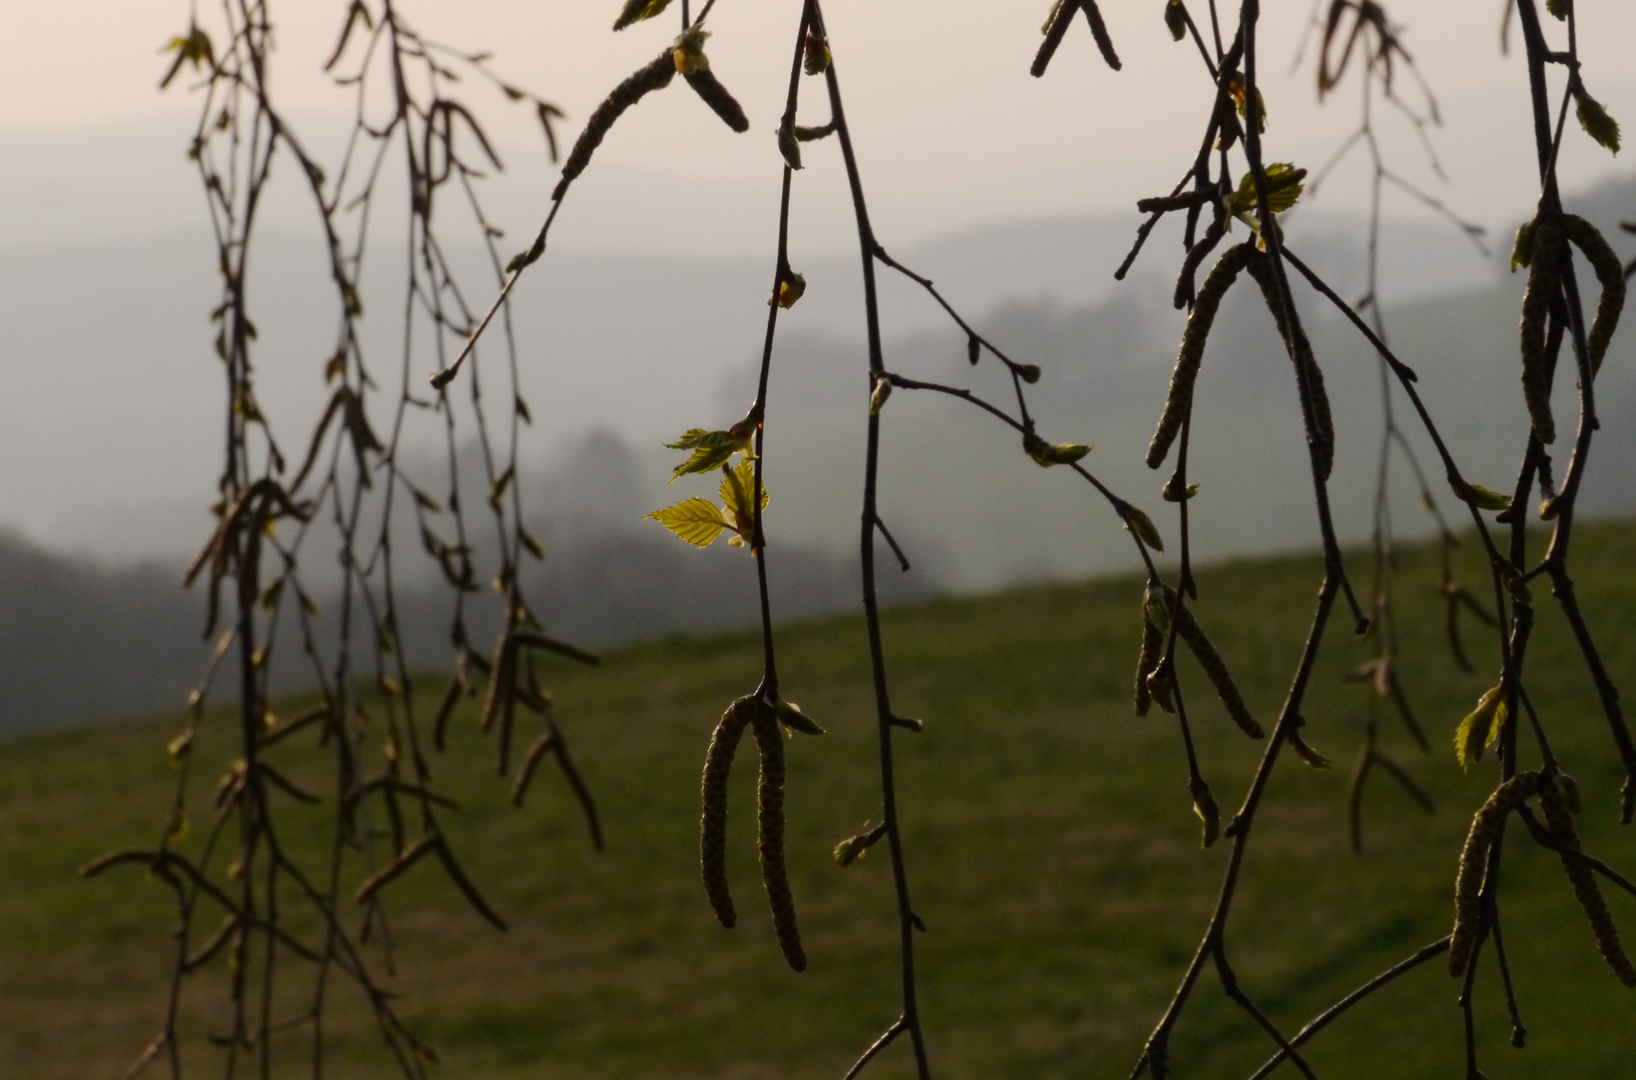 Der Hauch des Frühlings